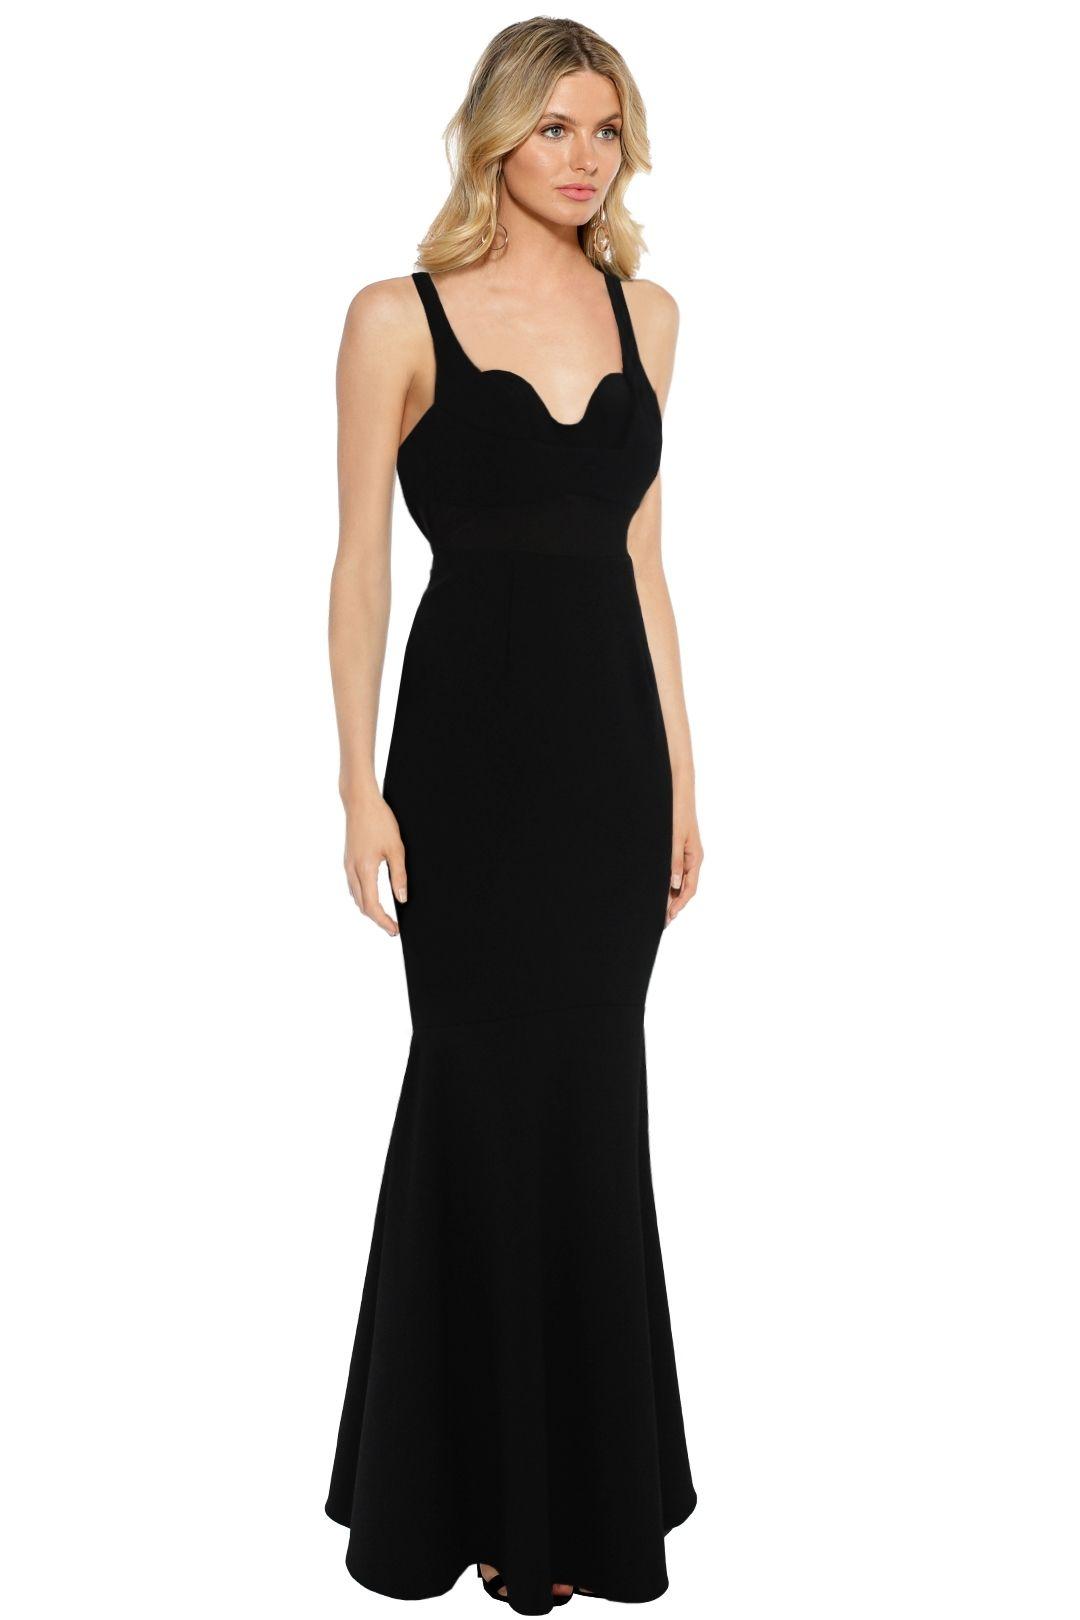 Sheike - Madrid Maxi Dress - Black - Side